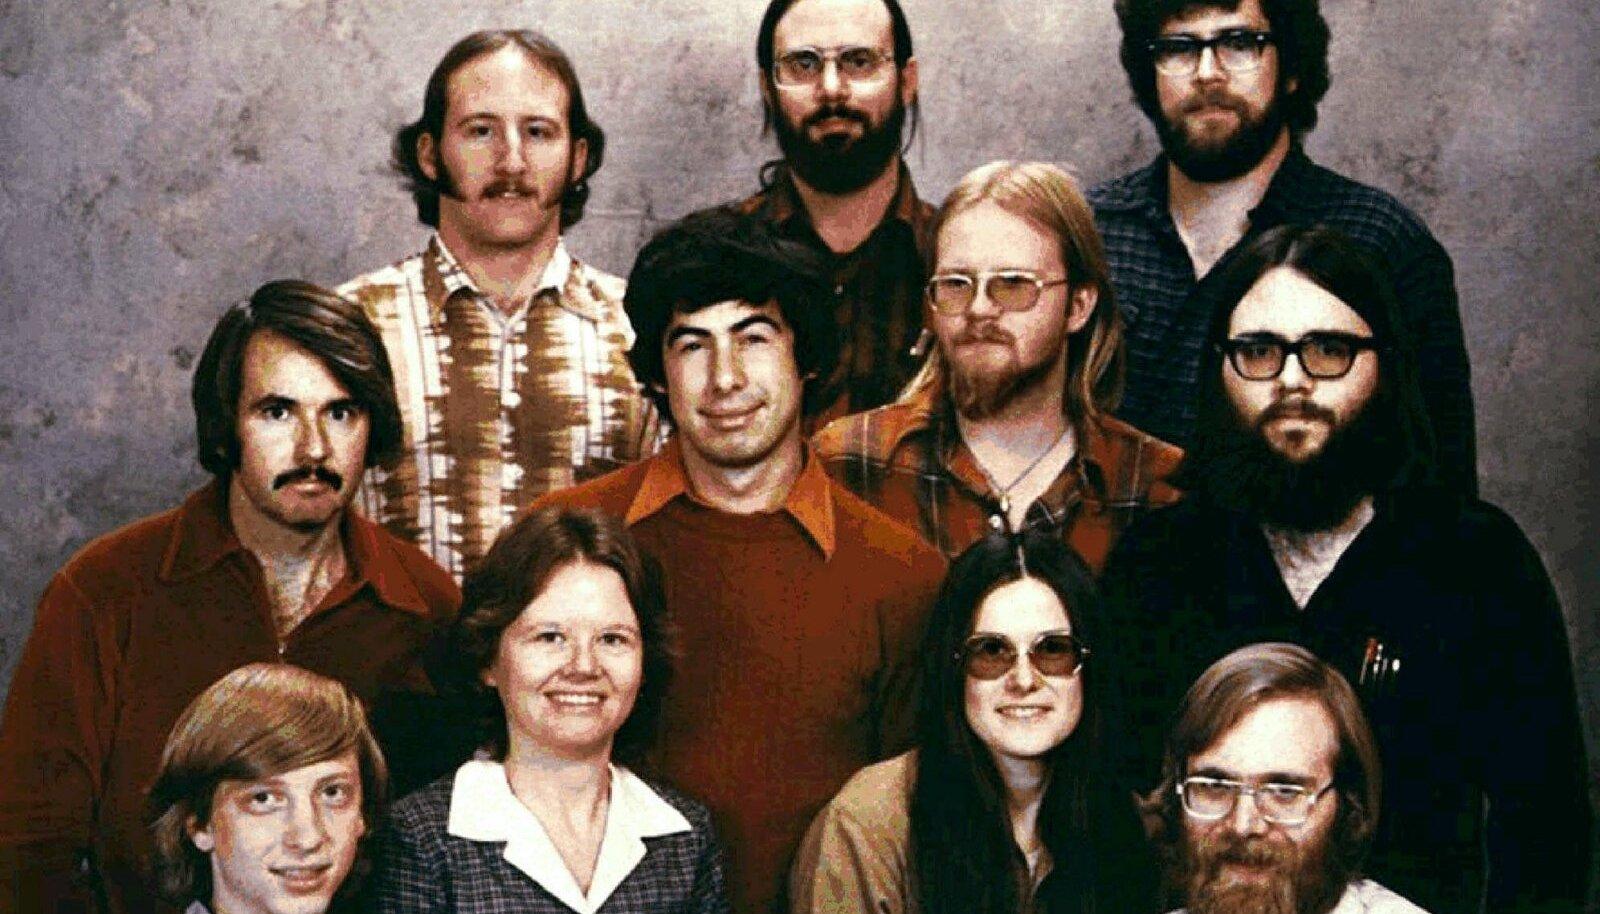 Ülevalt vasakult Steve Wood, Bob Wallace ja Jim Lane; Teises reas - Bob O Rear, Bob Greenberg, March McDonald ja Gordon Letwin; ja esireas, Bill Gates, Andrea Lewis, Marla Wood ja Paul Allen.